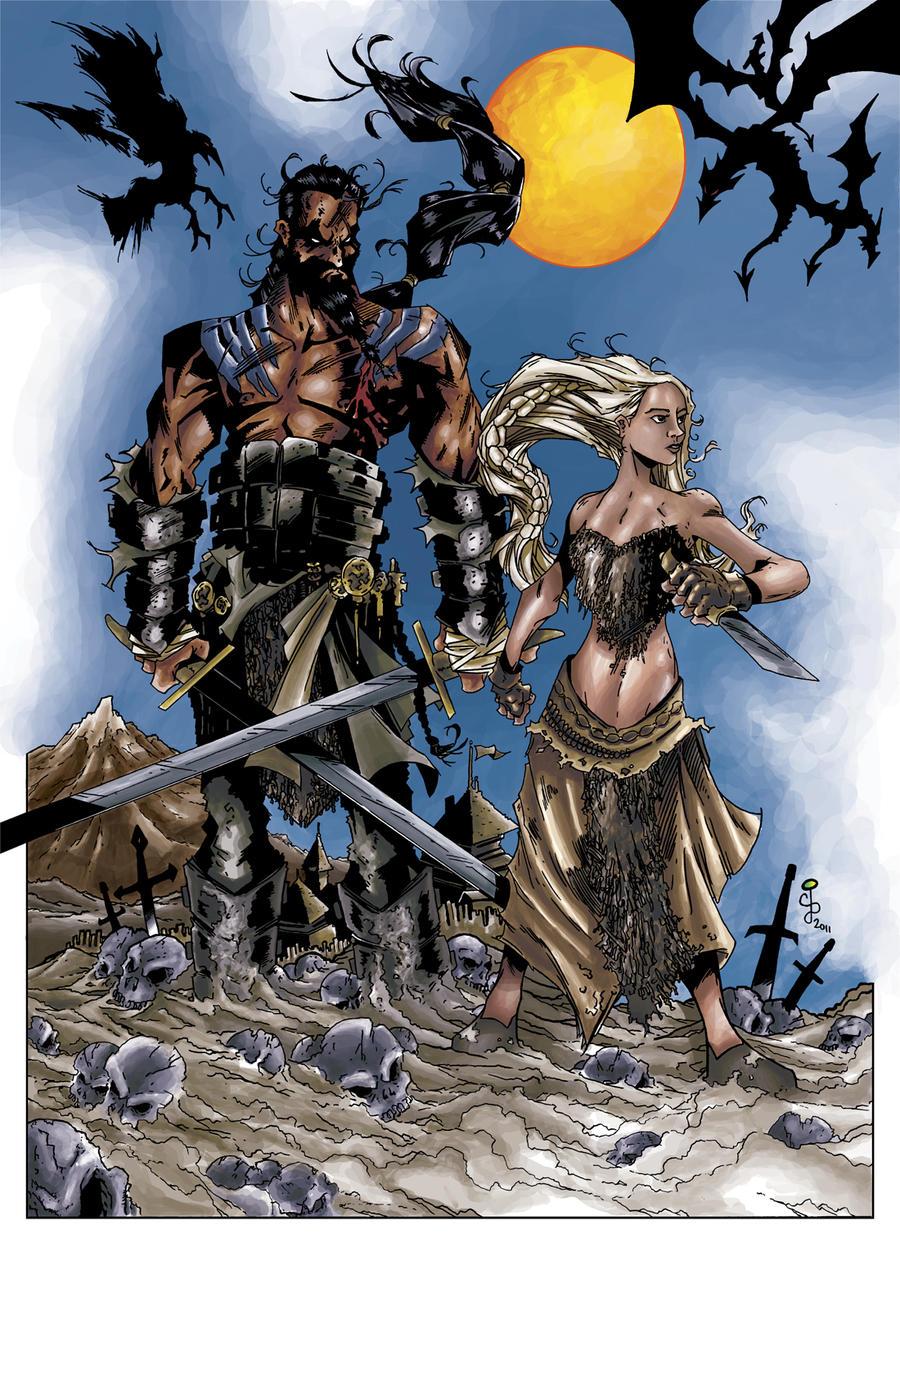 Khal Drogo and Khalessi